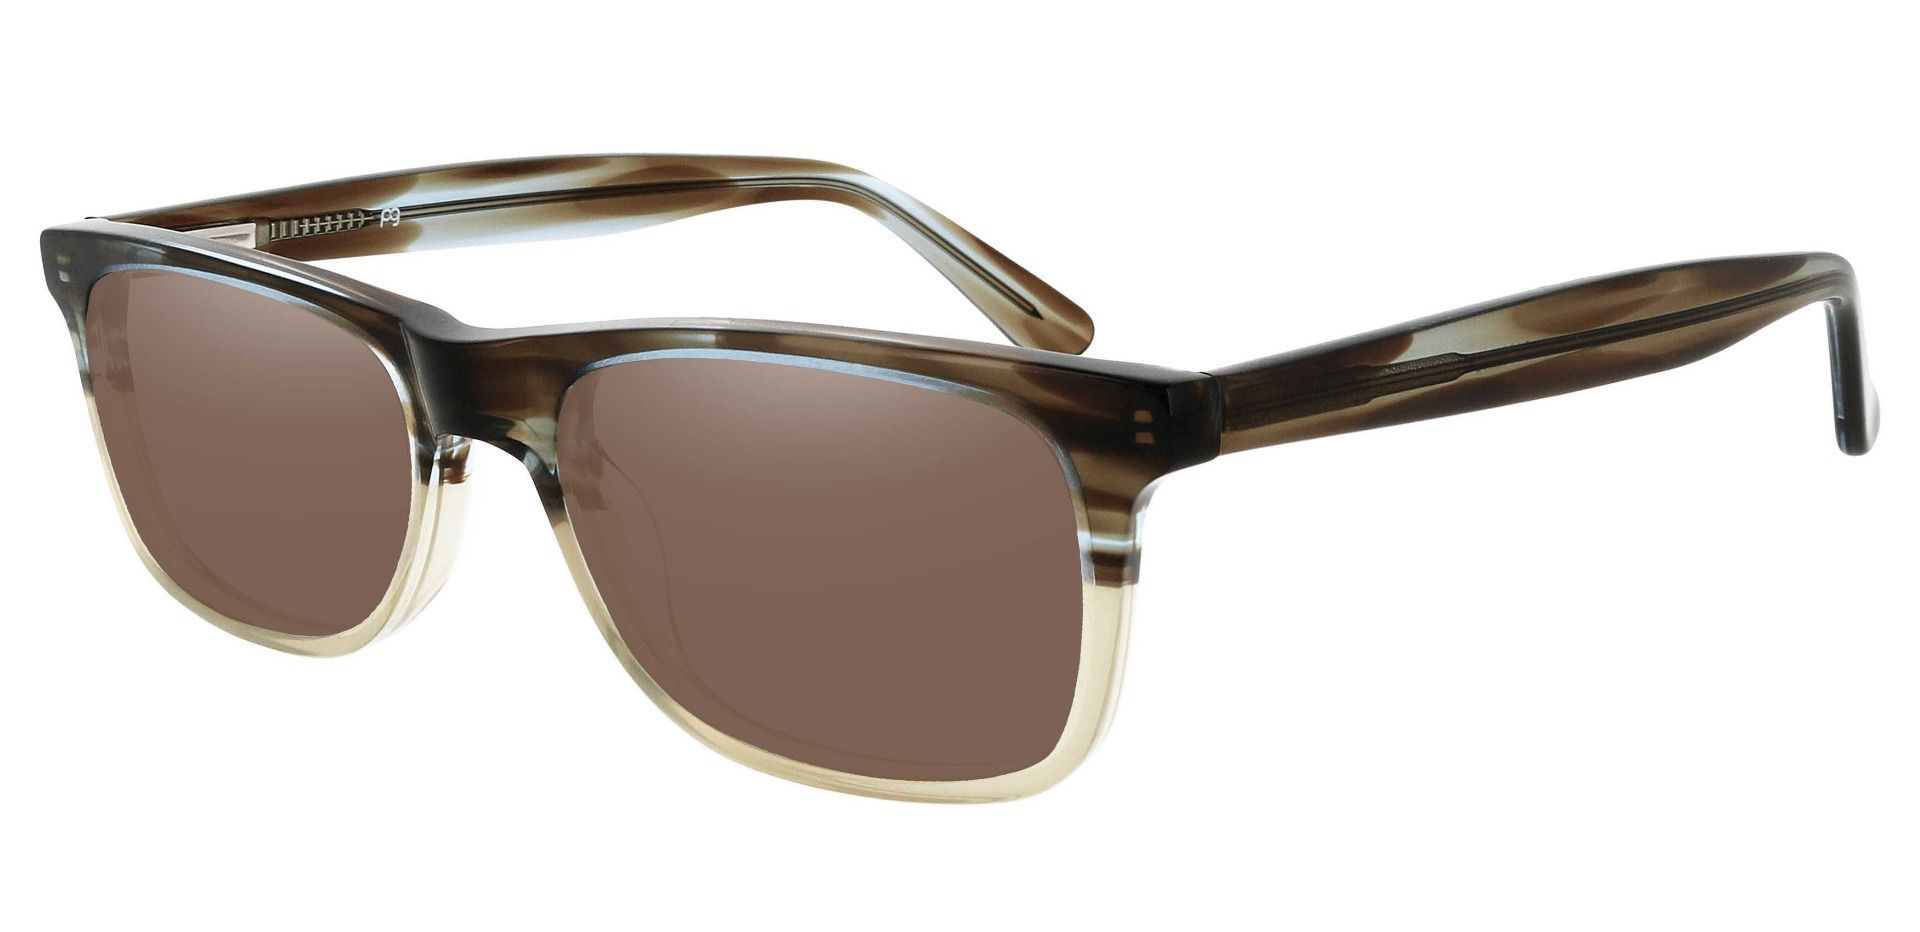 Denali Rectangle Progressive Sunglasses - Multi Color Frame With Brown Lenses